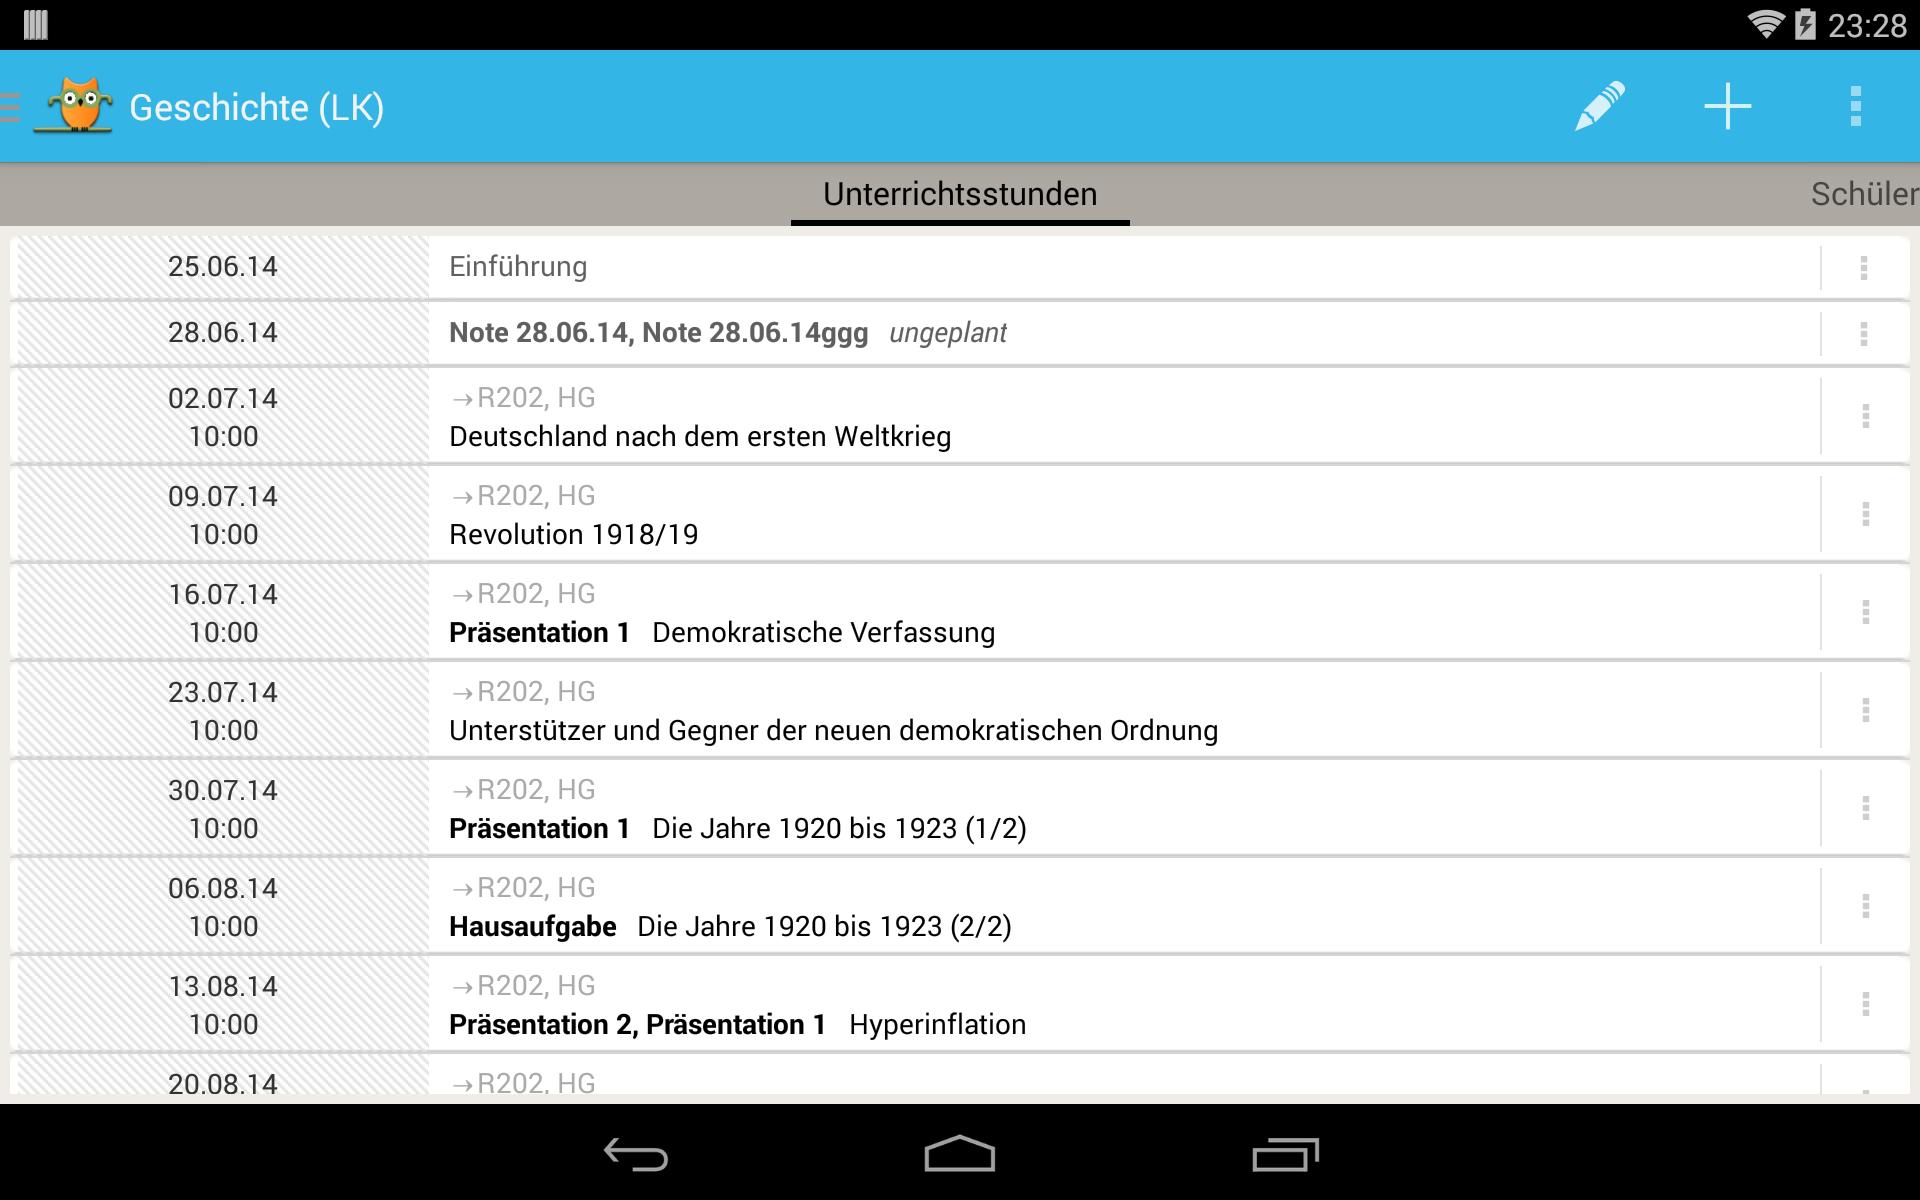 TeacherStudio-Handbuch-Android-Tablet-Kurs-Unterrichtsstunden